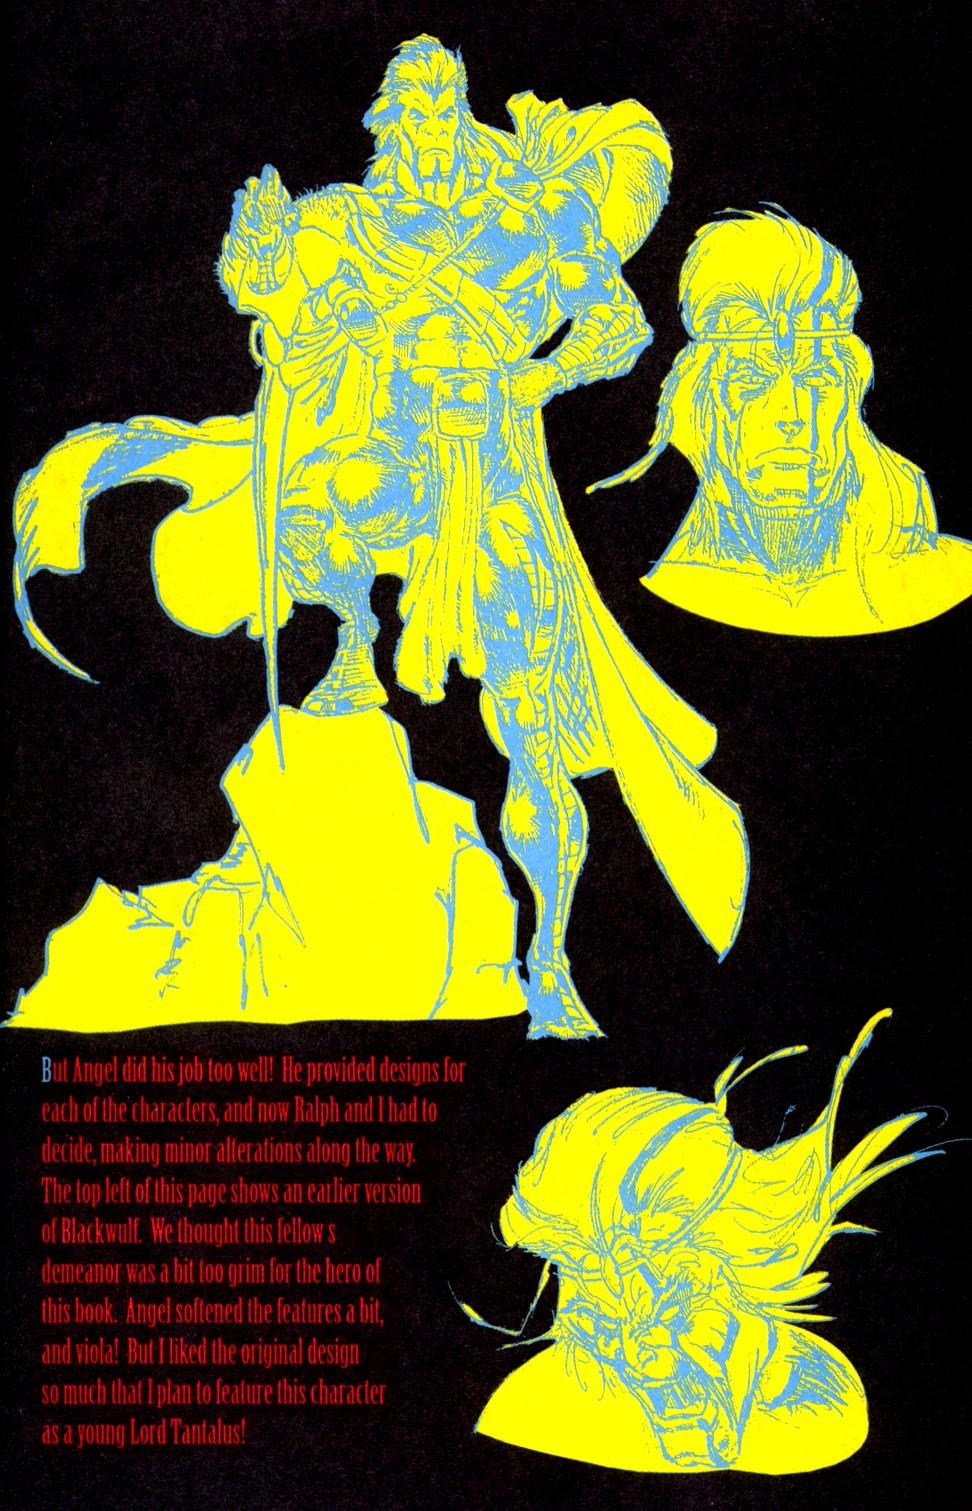 Read online Blackwulf comic -  Issue #6 - 17